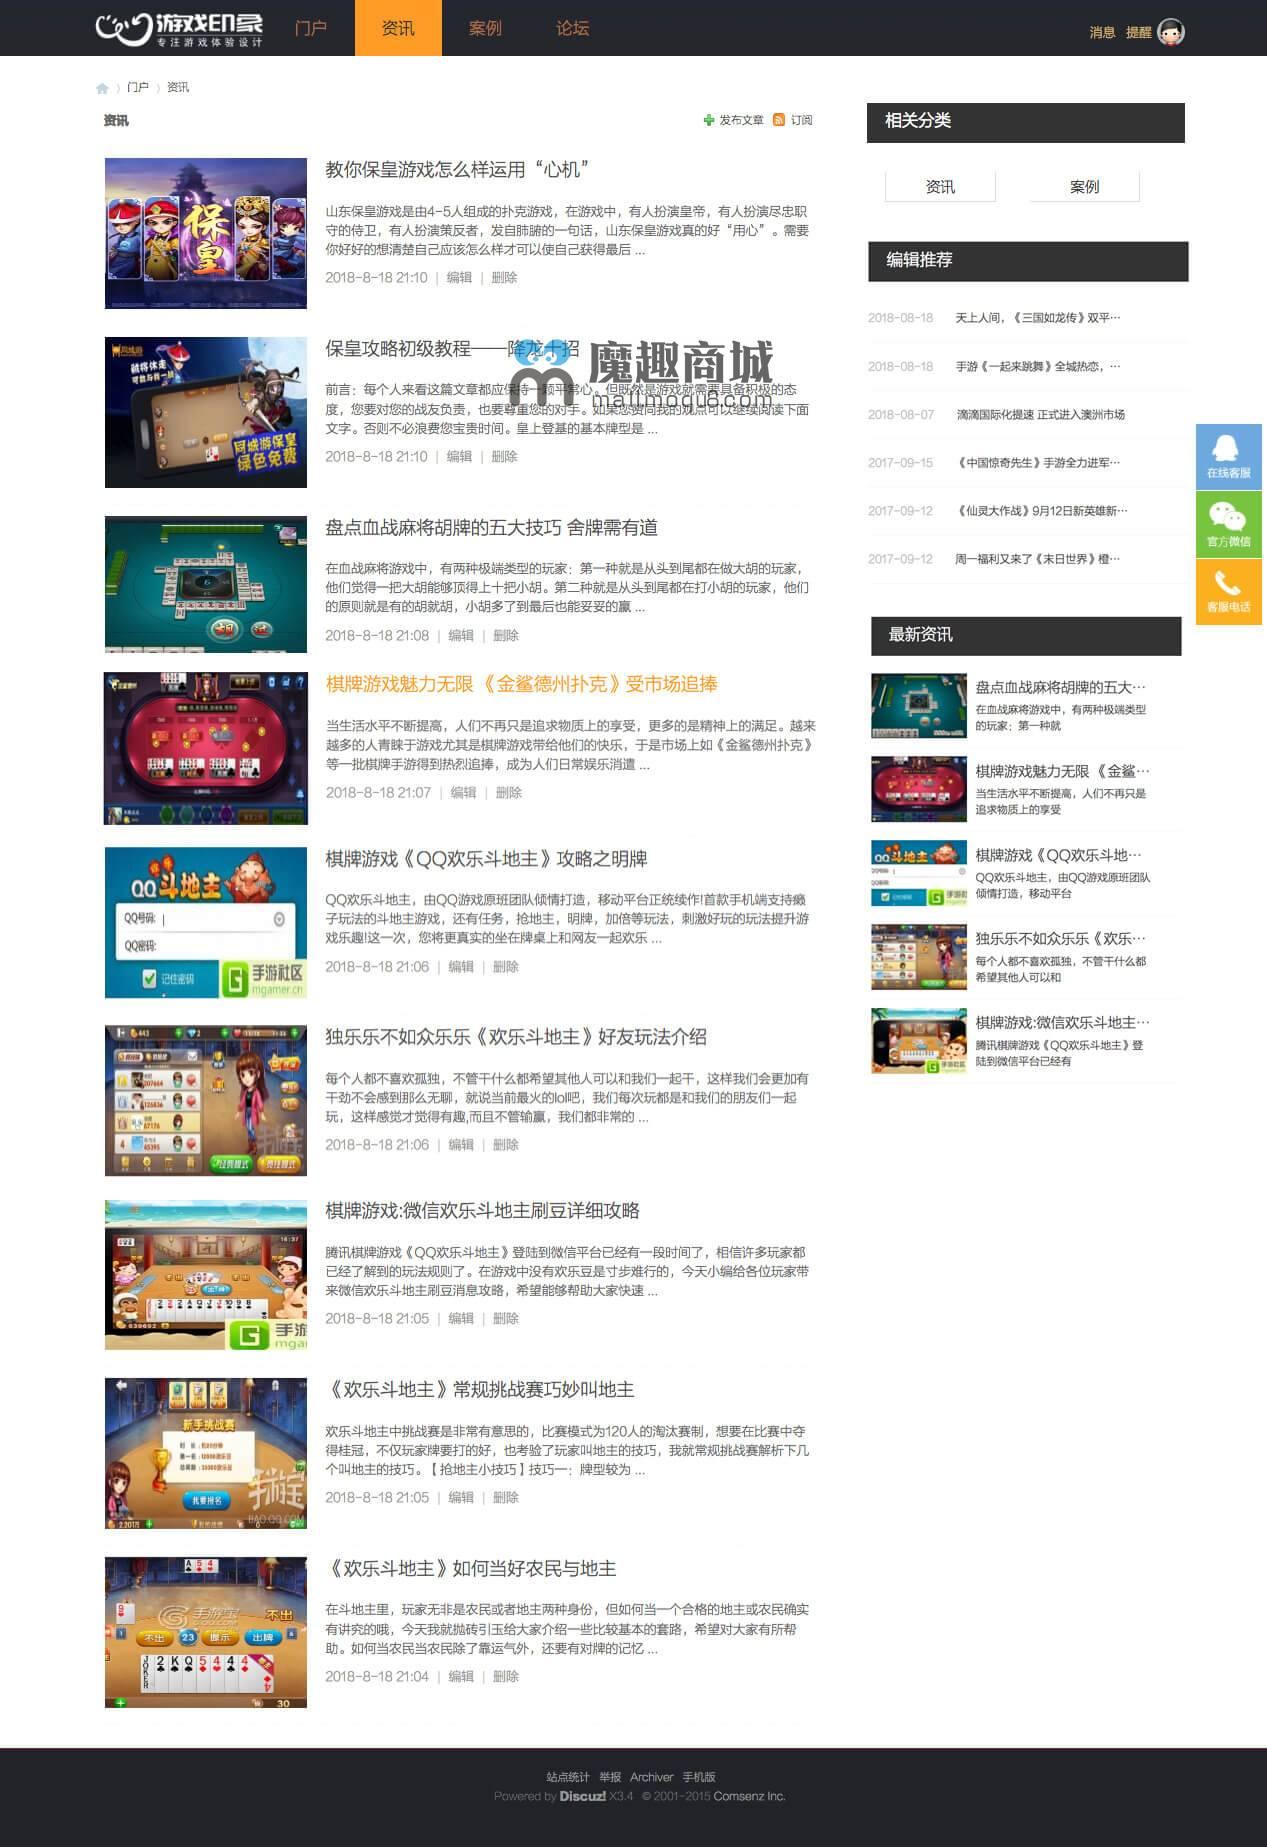 <font color='#CC5233'>通用游戏企业网站门户游戏资讯游戏介绍</font>